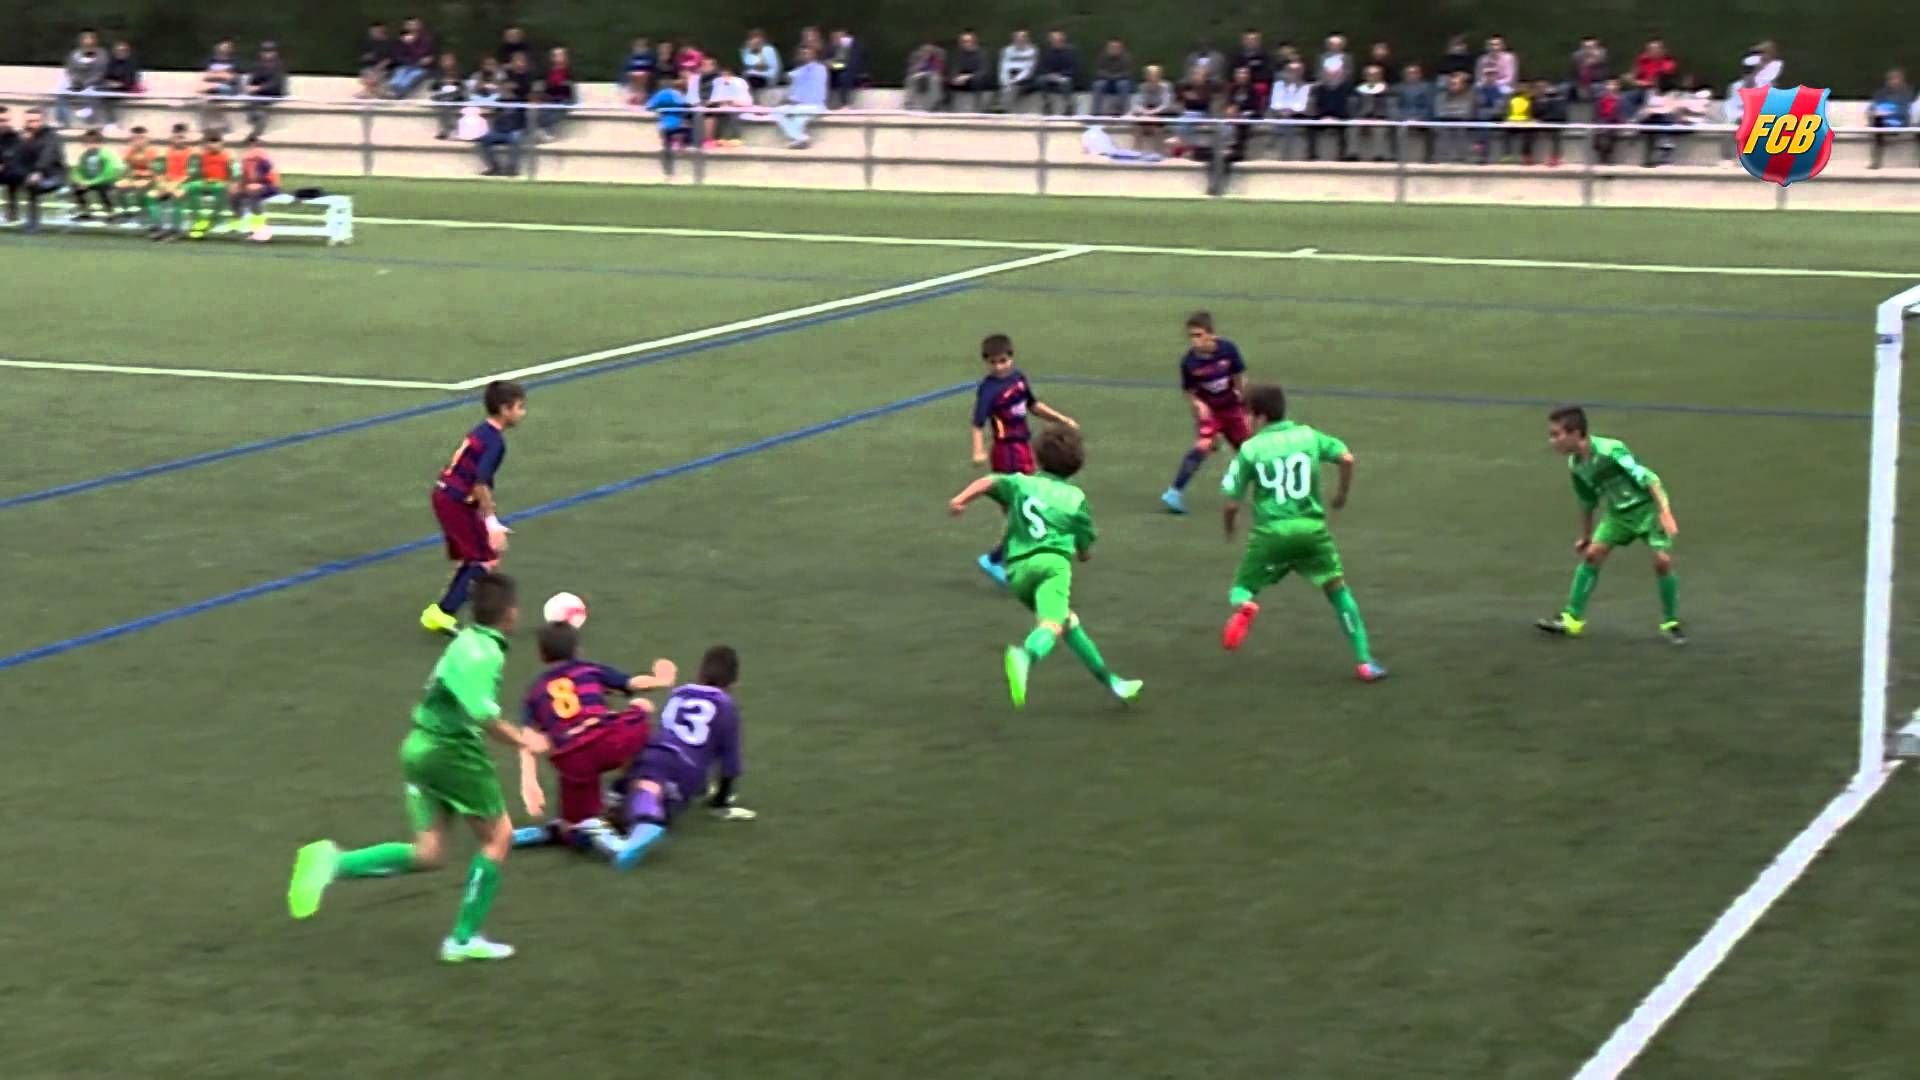 Kleiner Barcelona-Jugendspieler eifert Messi nach! [Video]…